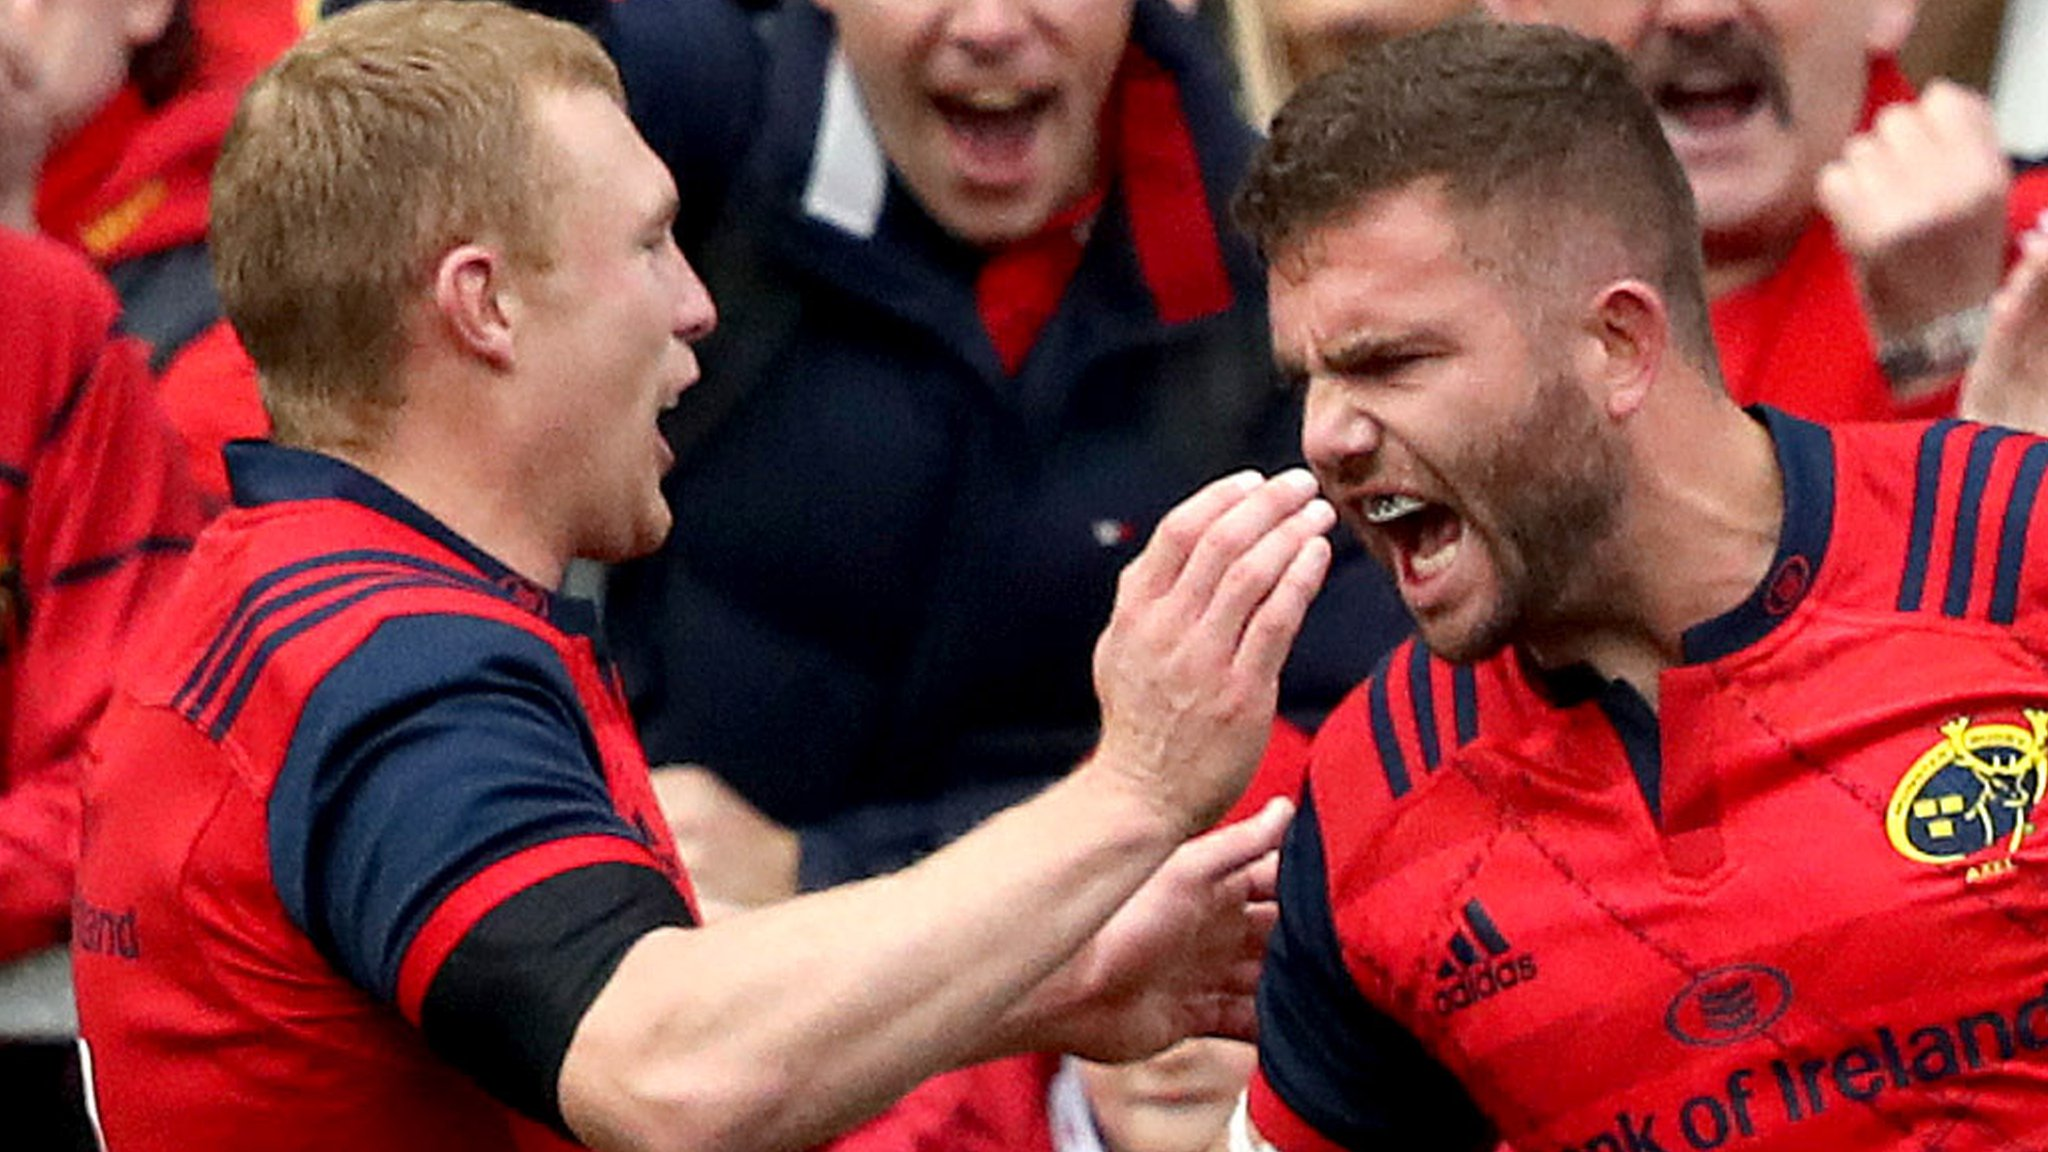 European Champions Cup: Munster 38-17 Glasgow Warriors